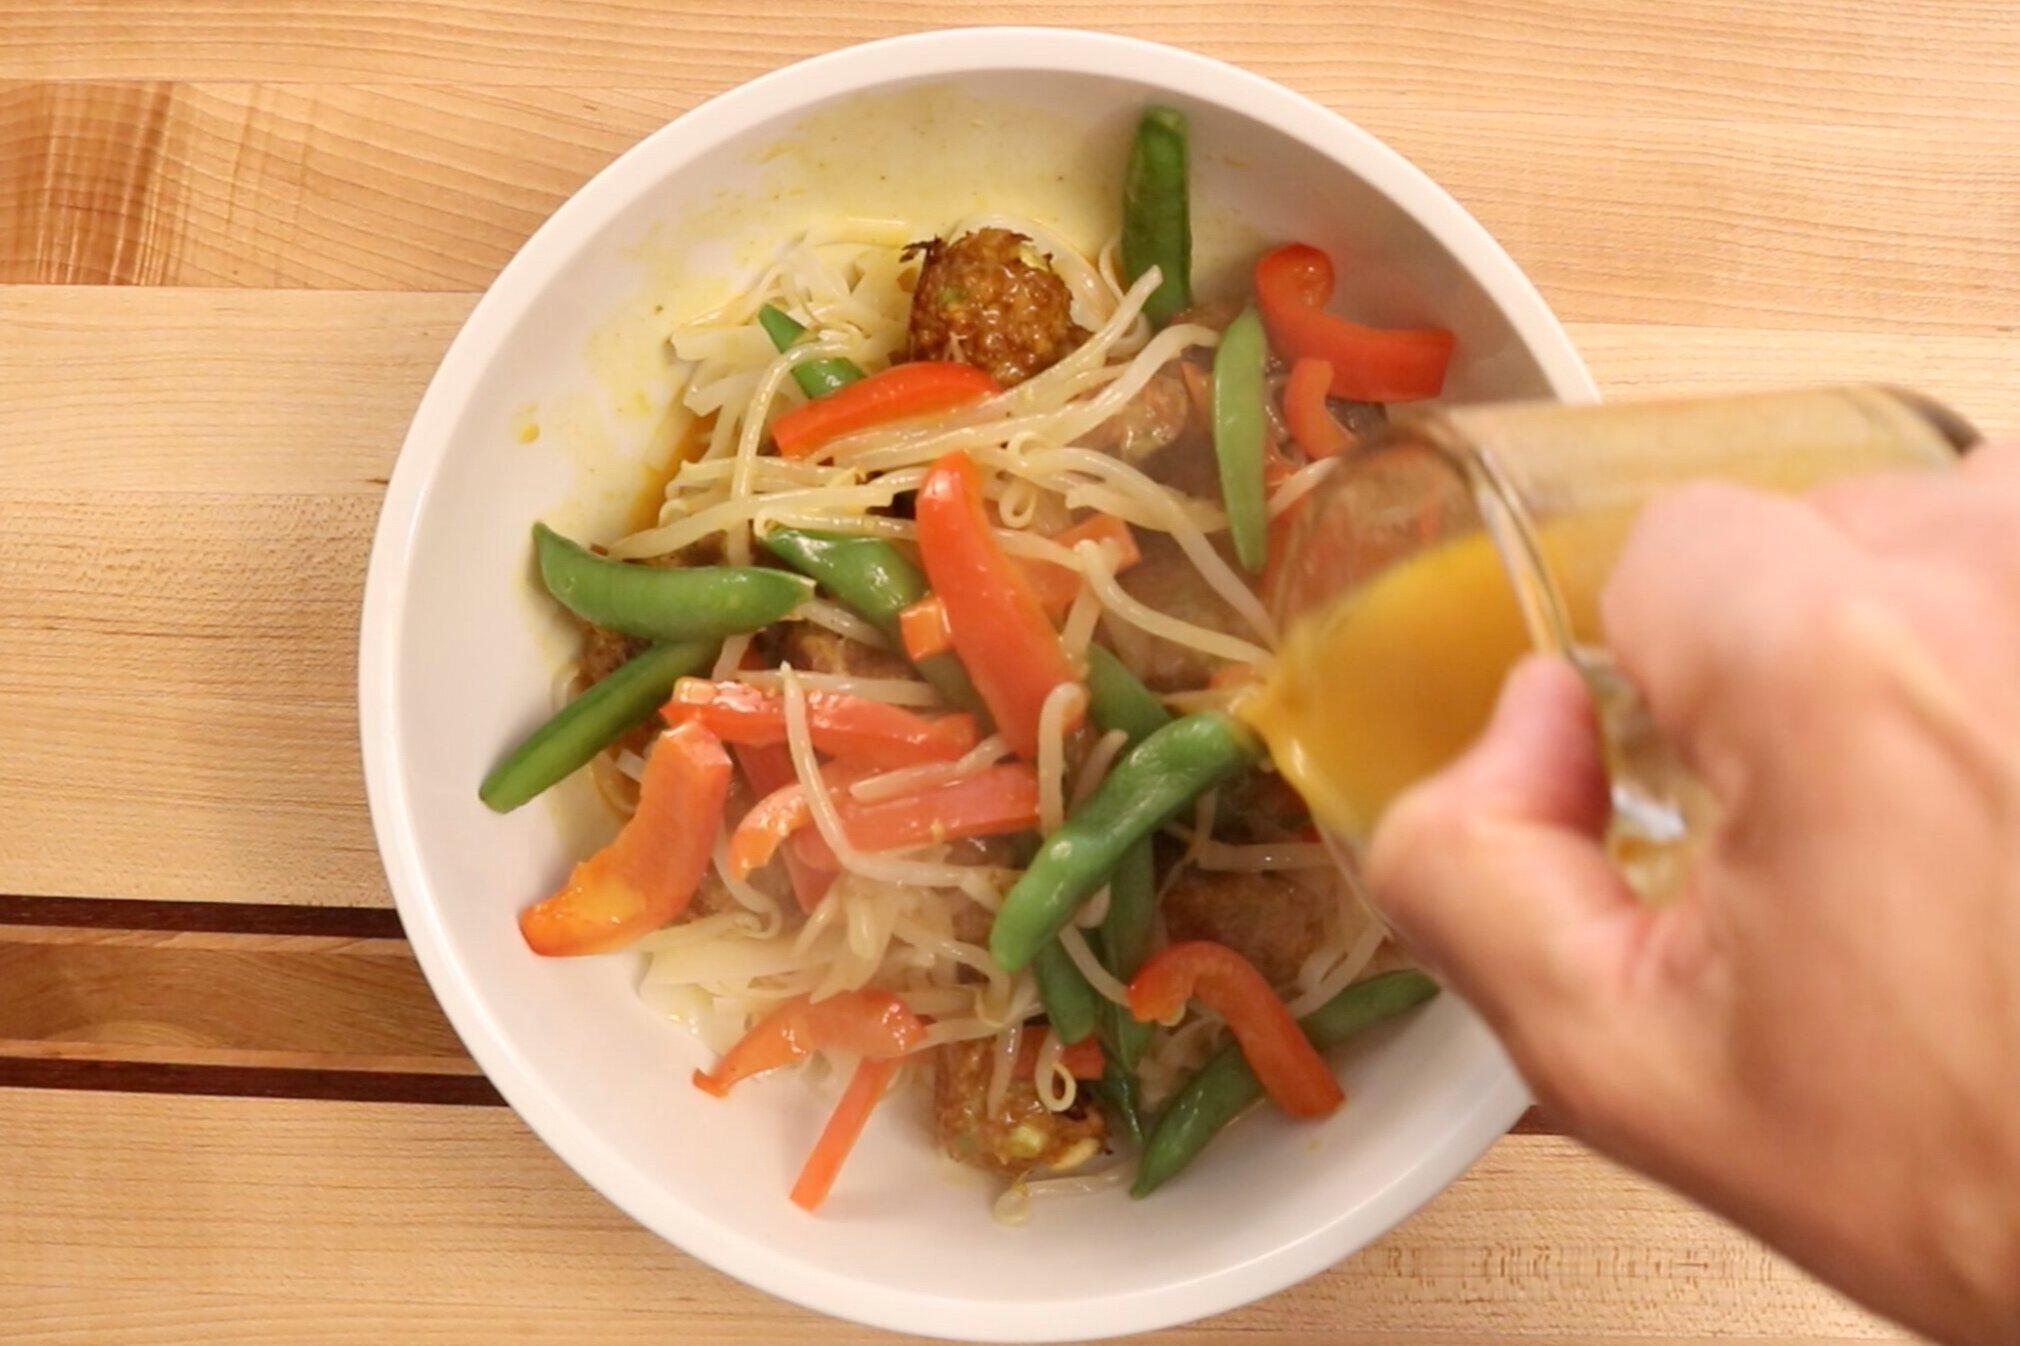 13. Split the noodles, veggies, meatballs and broth between 2-4 bowls. -